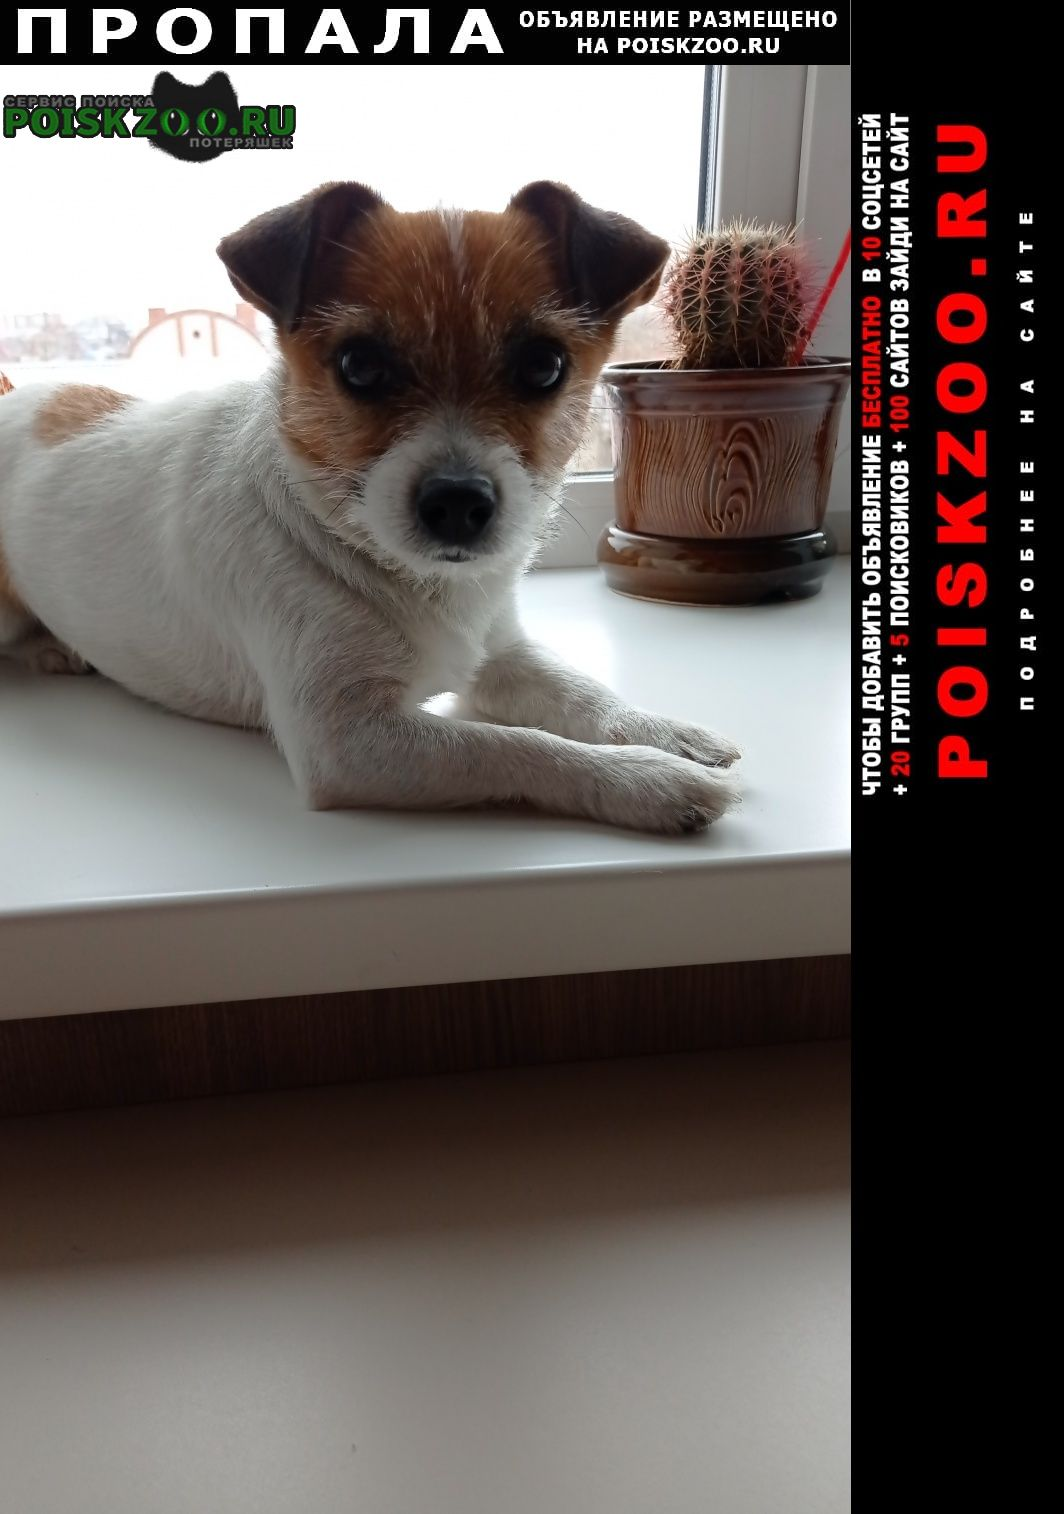 Пропала собака кобель джек рассел терьер Барнаул